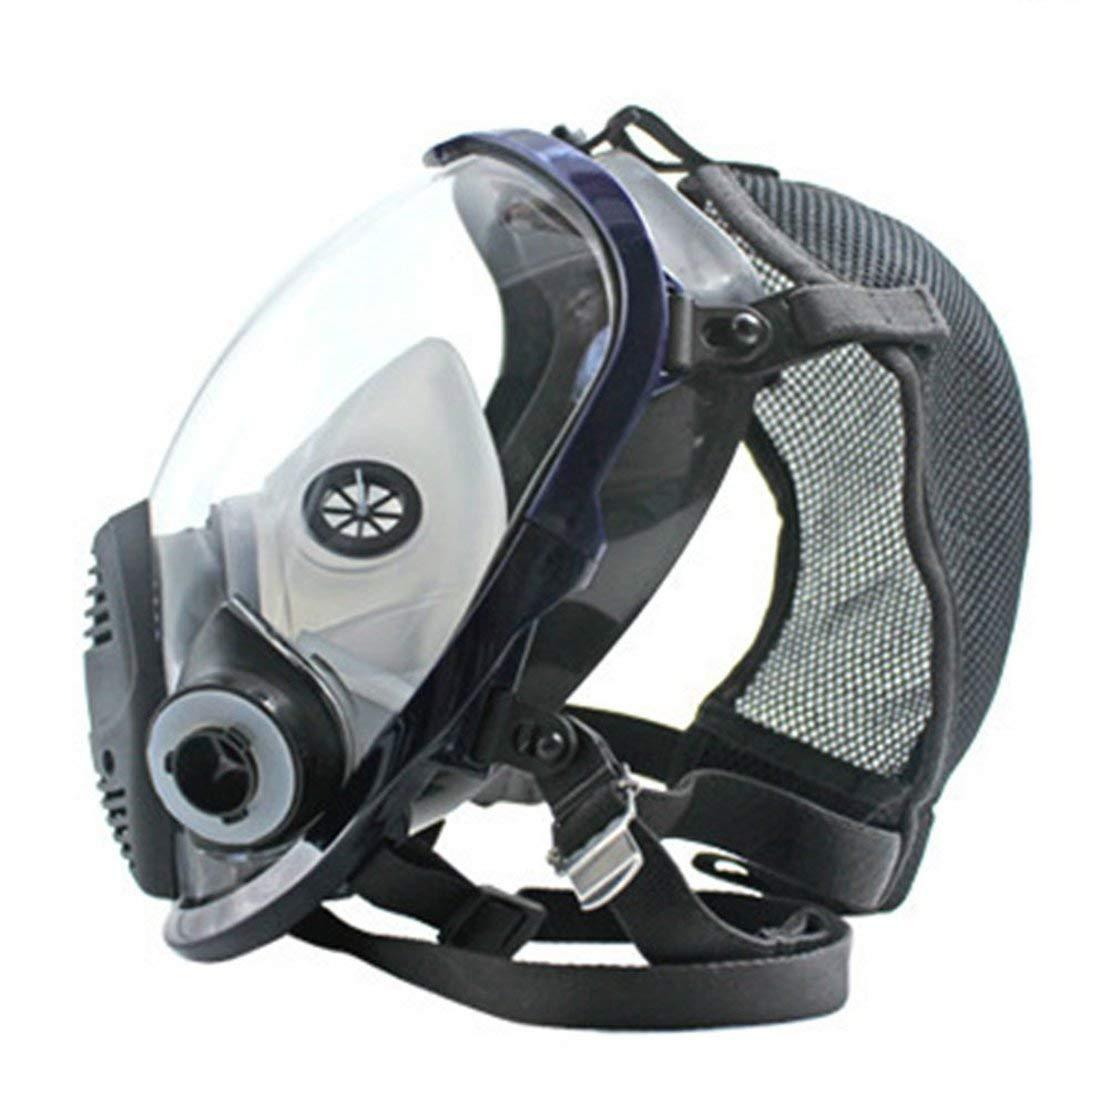 R Mascarilla Protectora TOOGOO Airsoft Mascara Mascarilla Protectora de Malla para //Deportista //Motorista// Esquiador